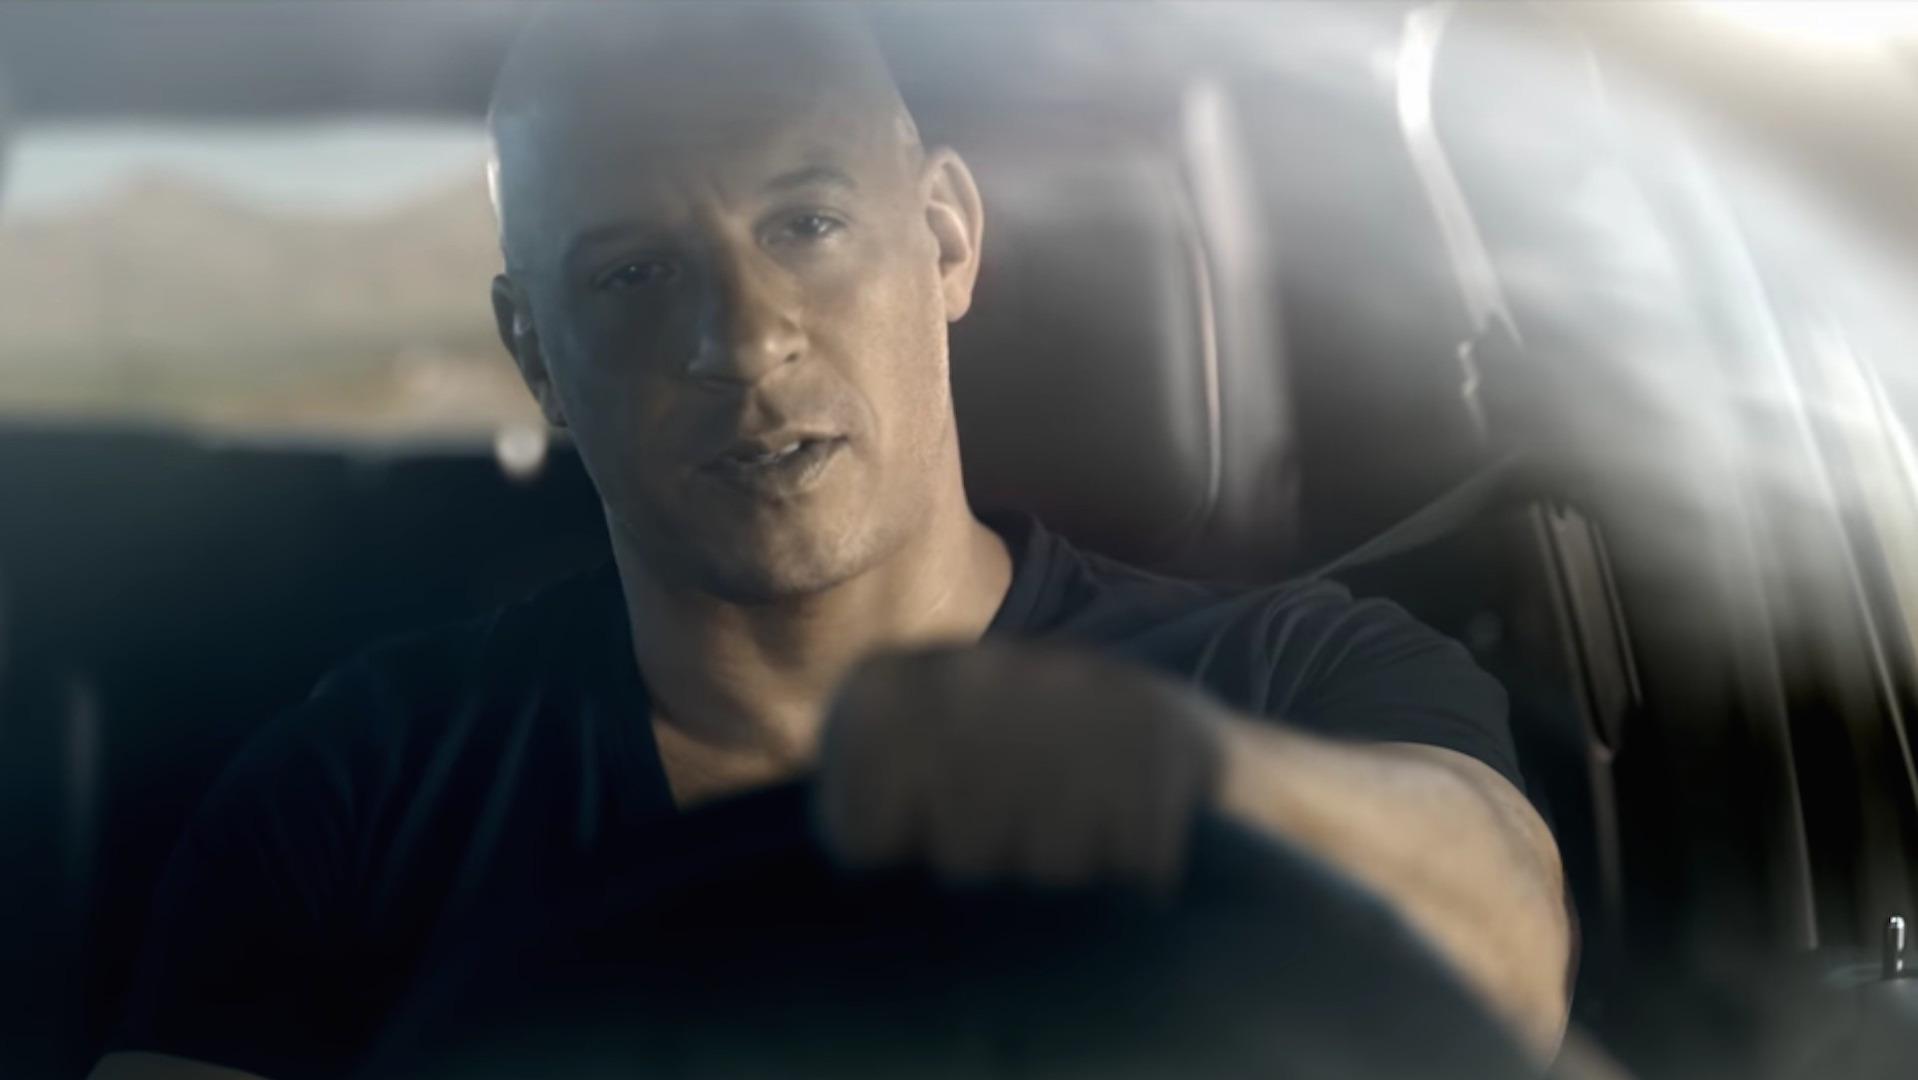 Charger Srt Hellcat >> Vin Diesel Flexes His Muscle In New Dodge SRT Commercials